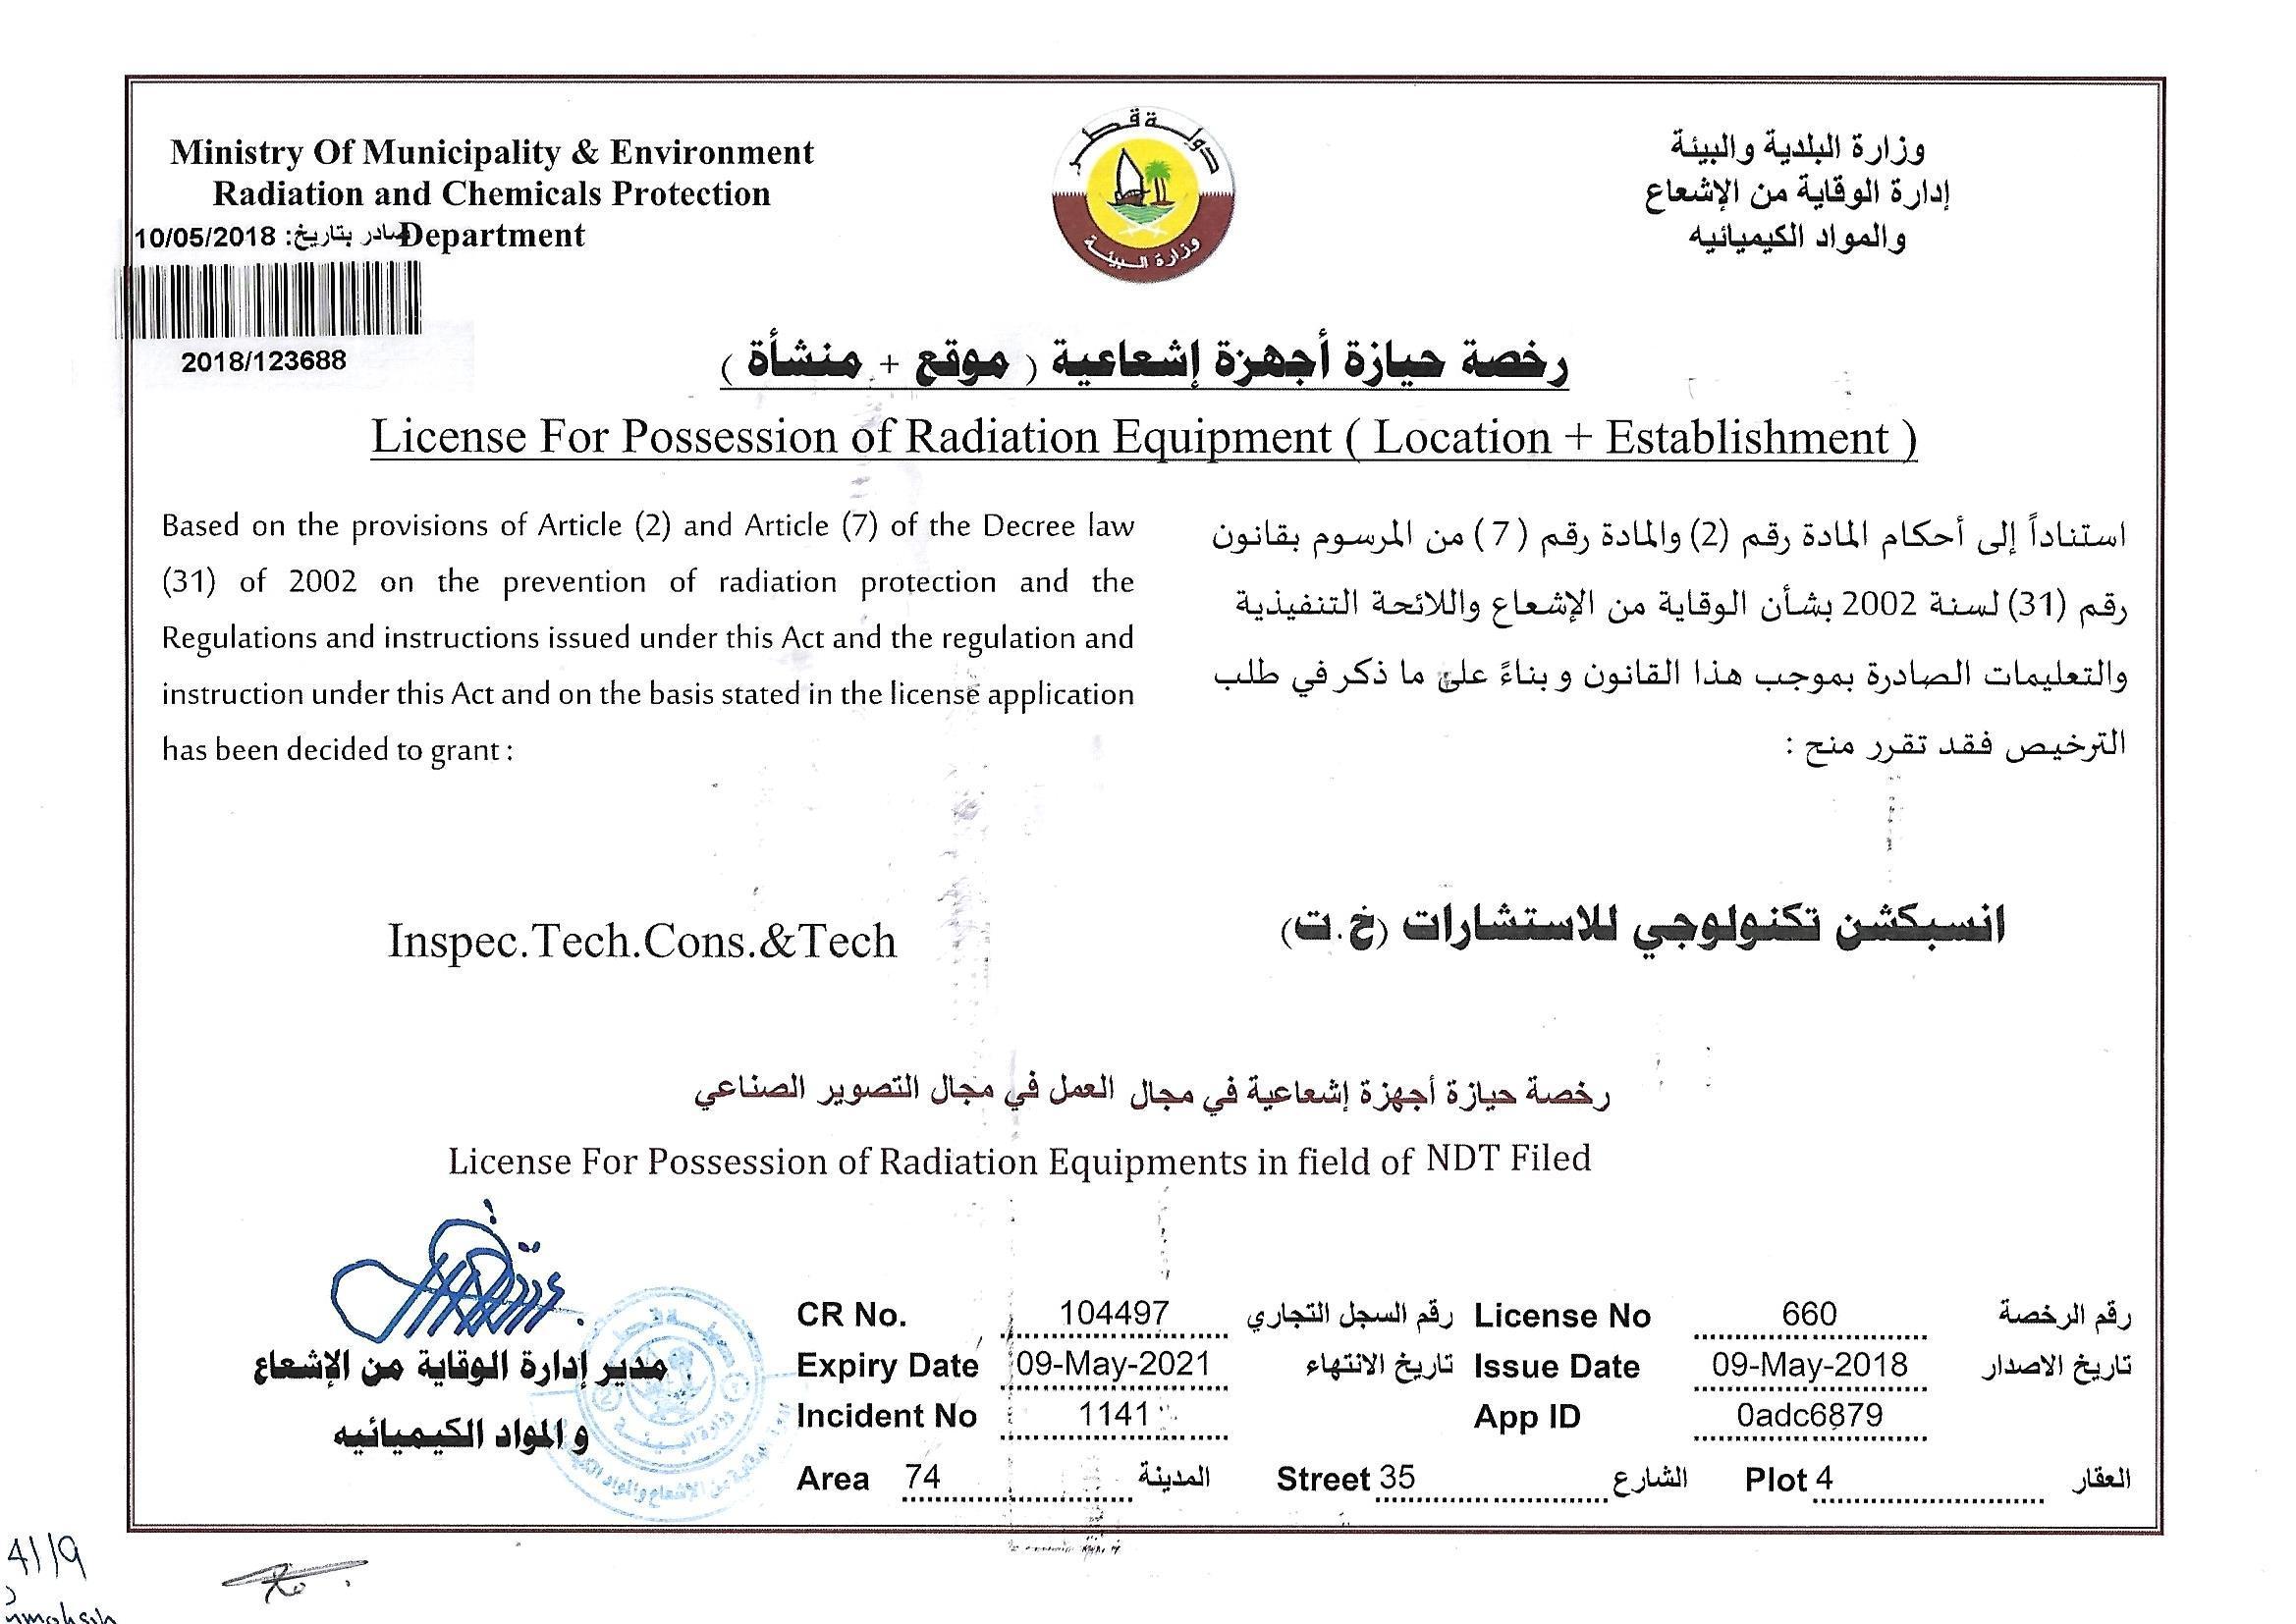 License 660 For Possession of Radiation Equipment 09.05.2021